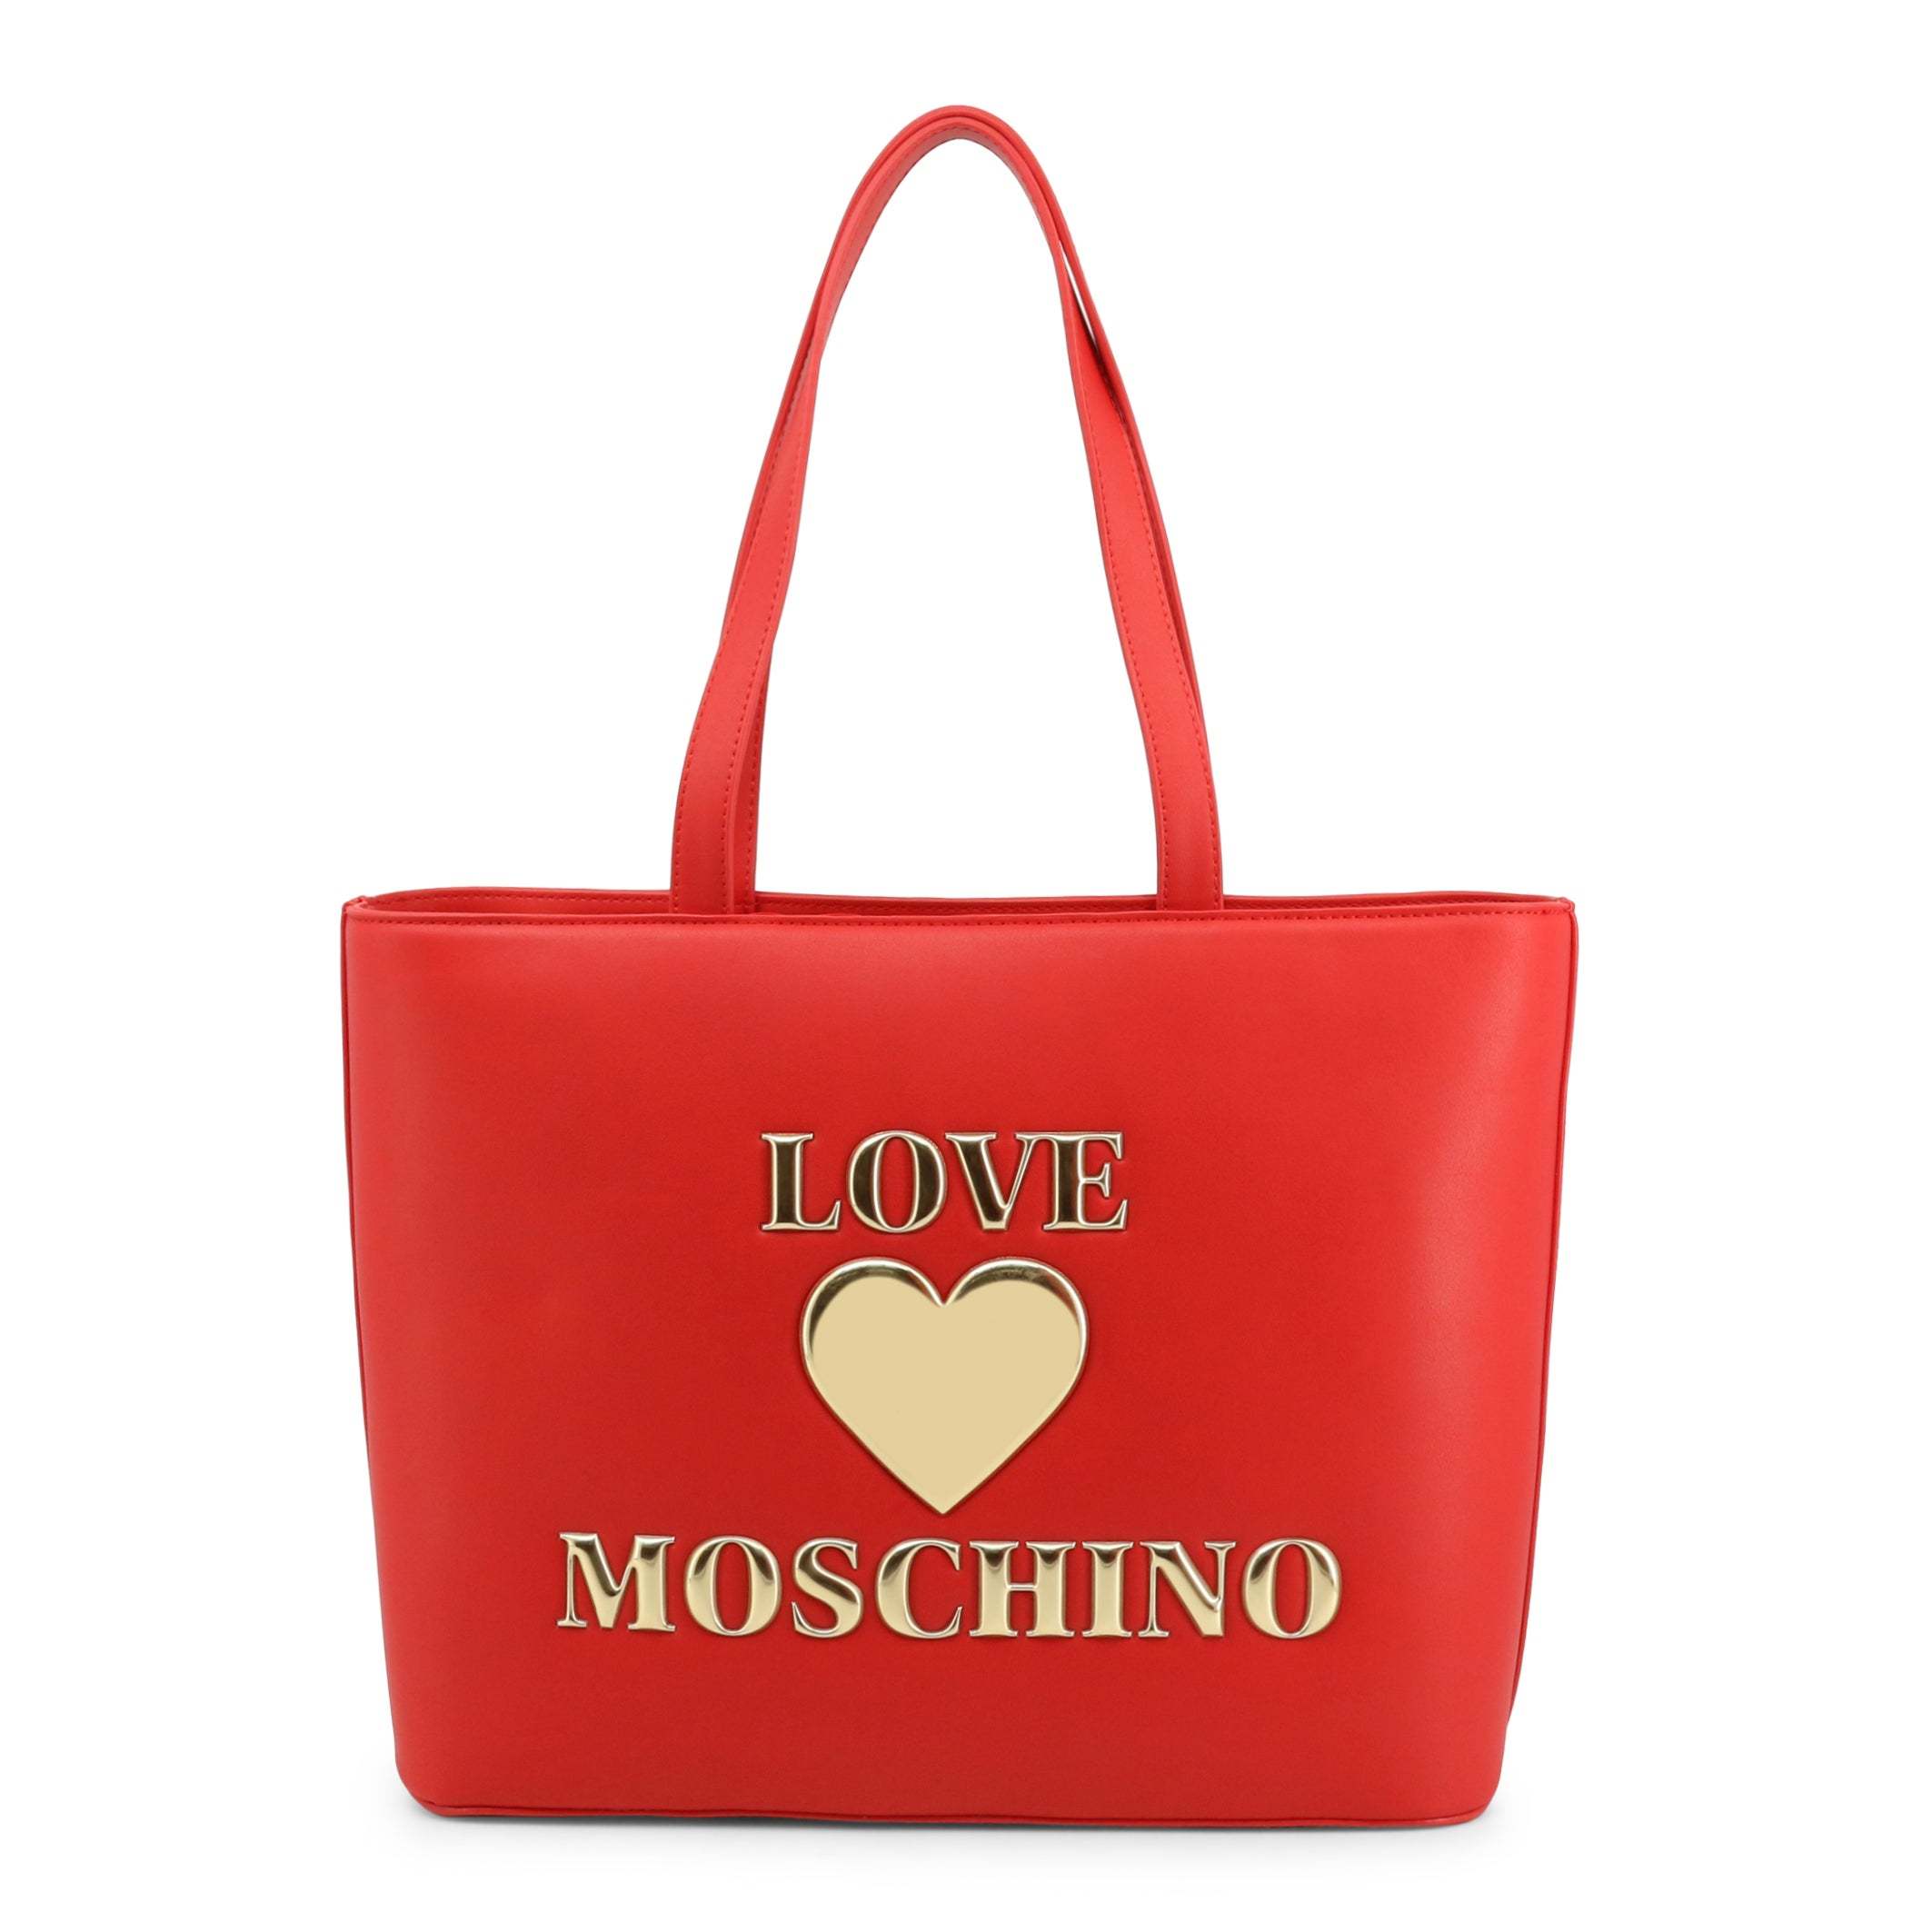 Love Moschino Womens Shopping Bags